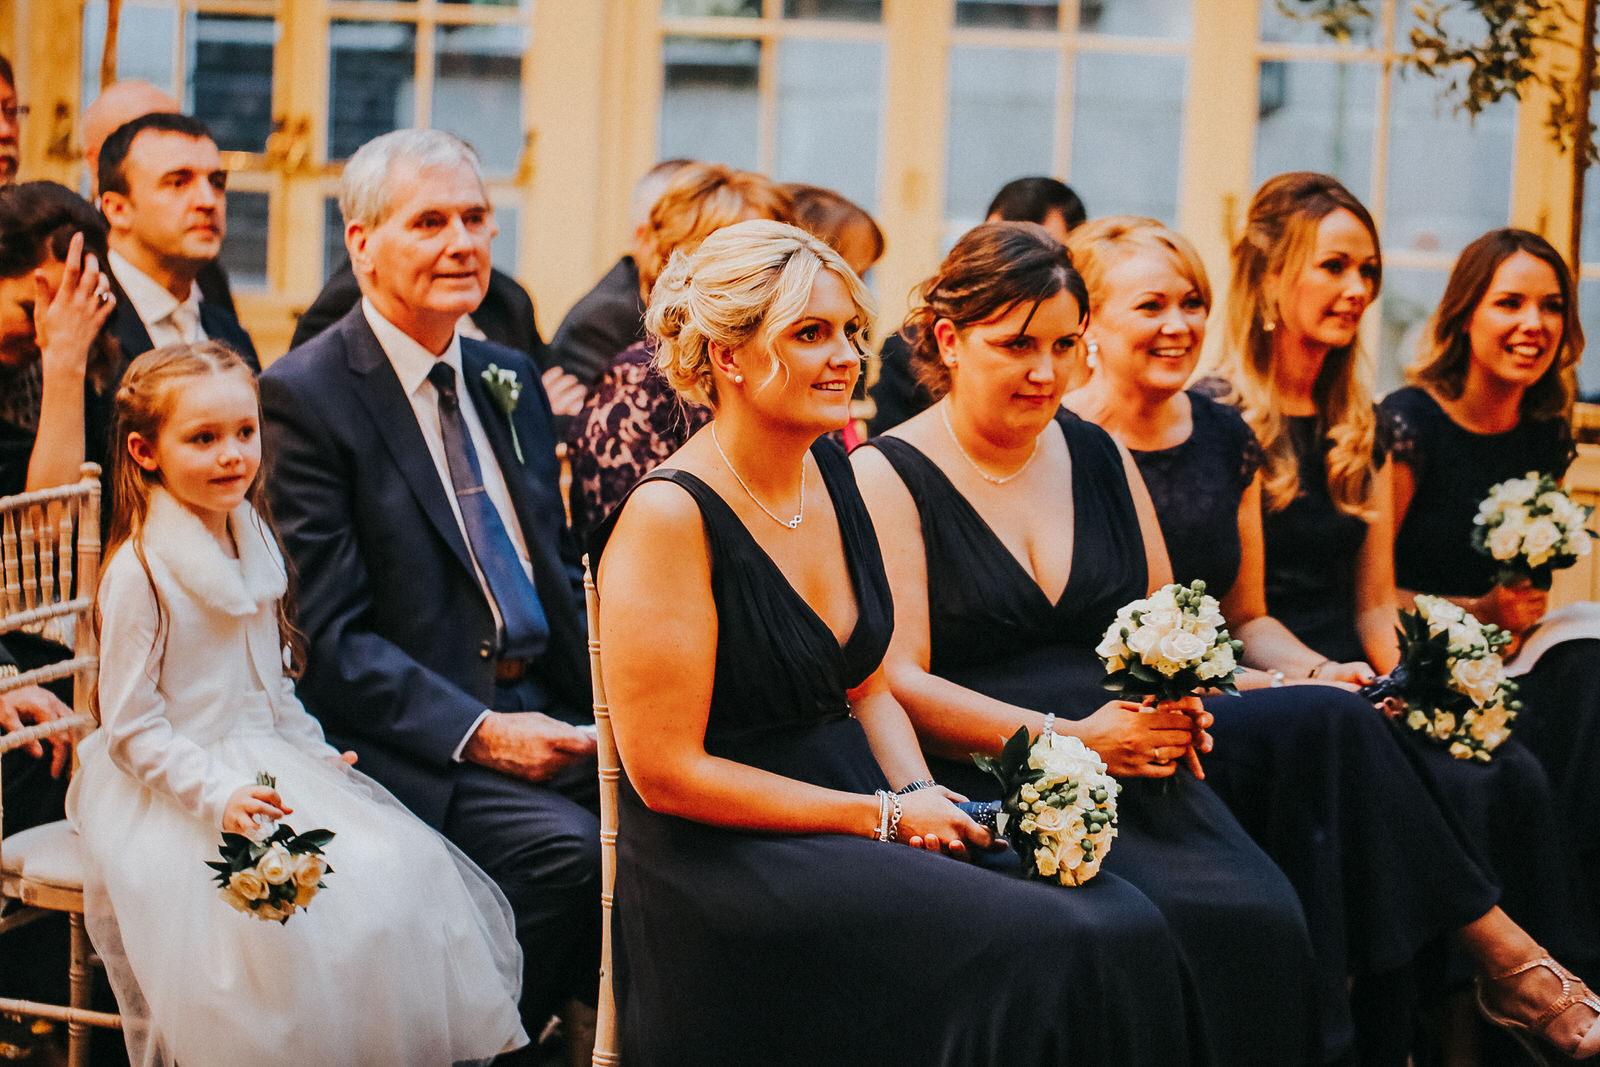 Roger_Kenny_wedding_photographer_Tankardstown_603.jpg